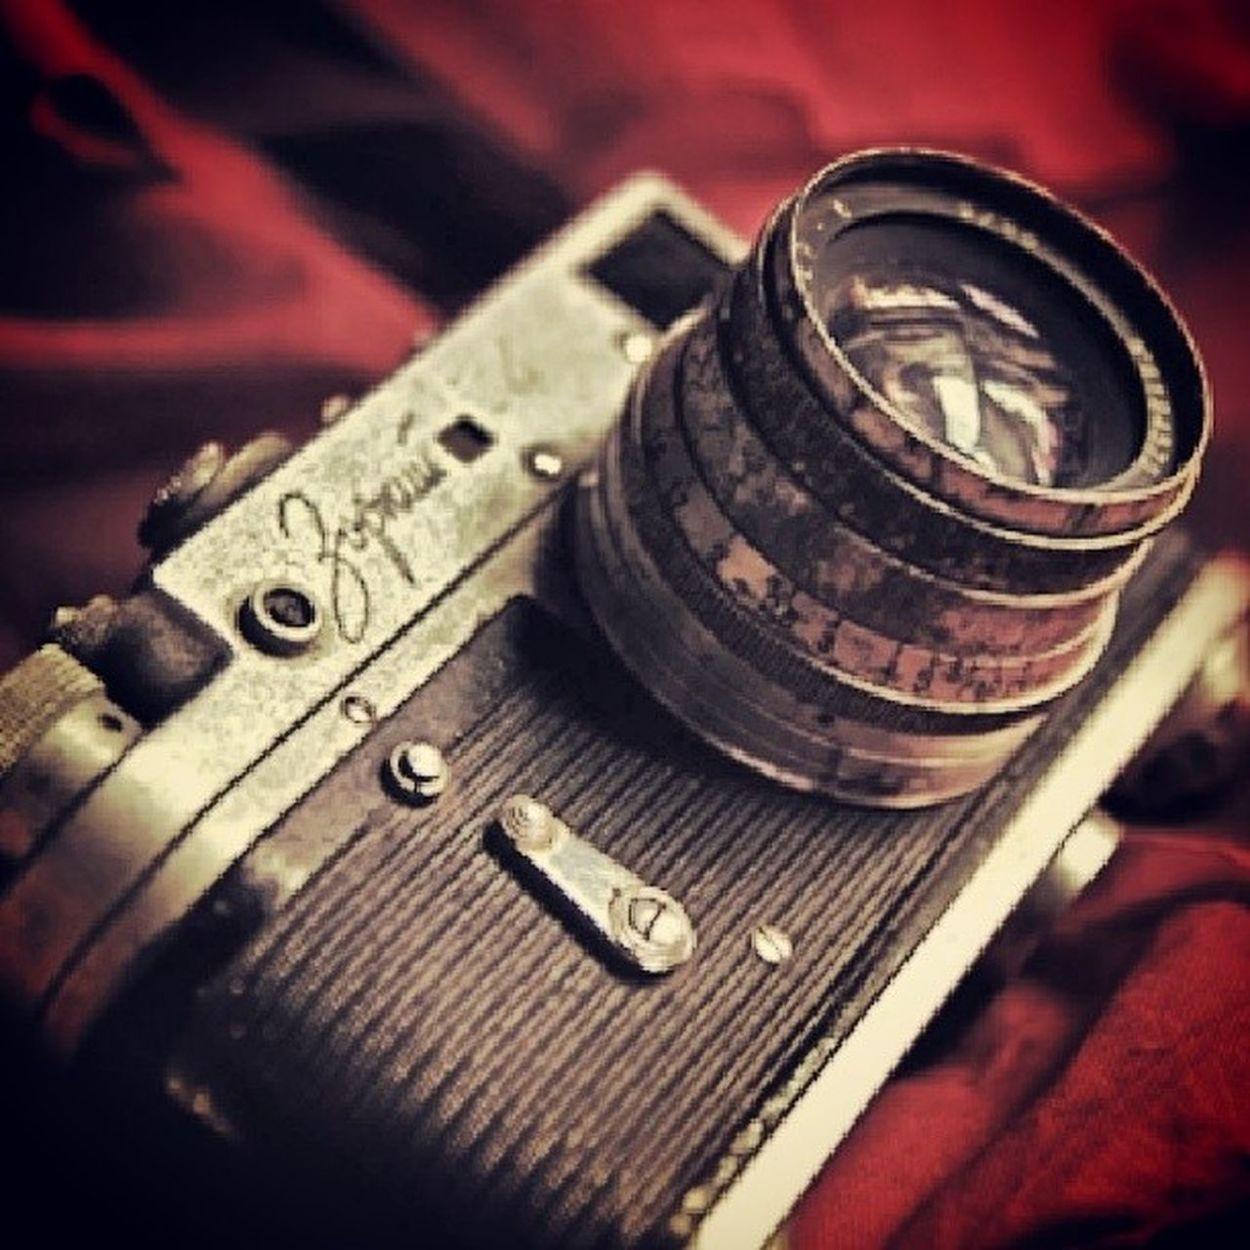 Camera Analoguecamera Vintage Red Antique Effect InstaFrame Igmasters Instapic Instaphotomatix Instasave Instabest Instamood Photograph Art Clasic Colour Film